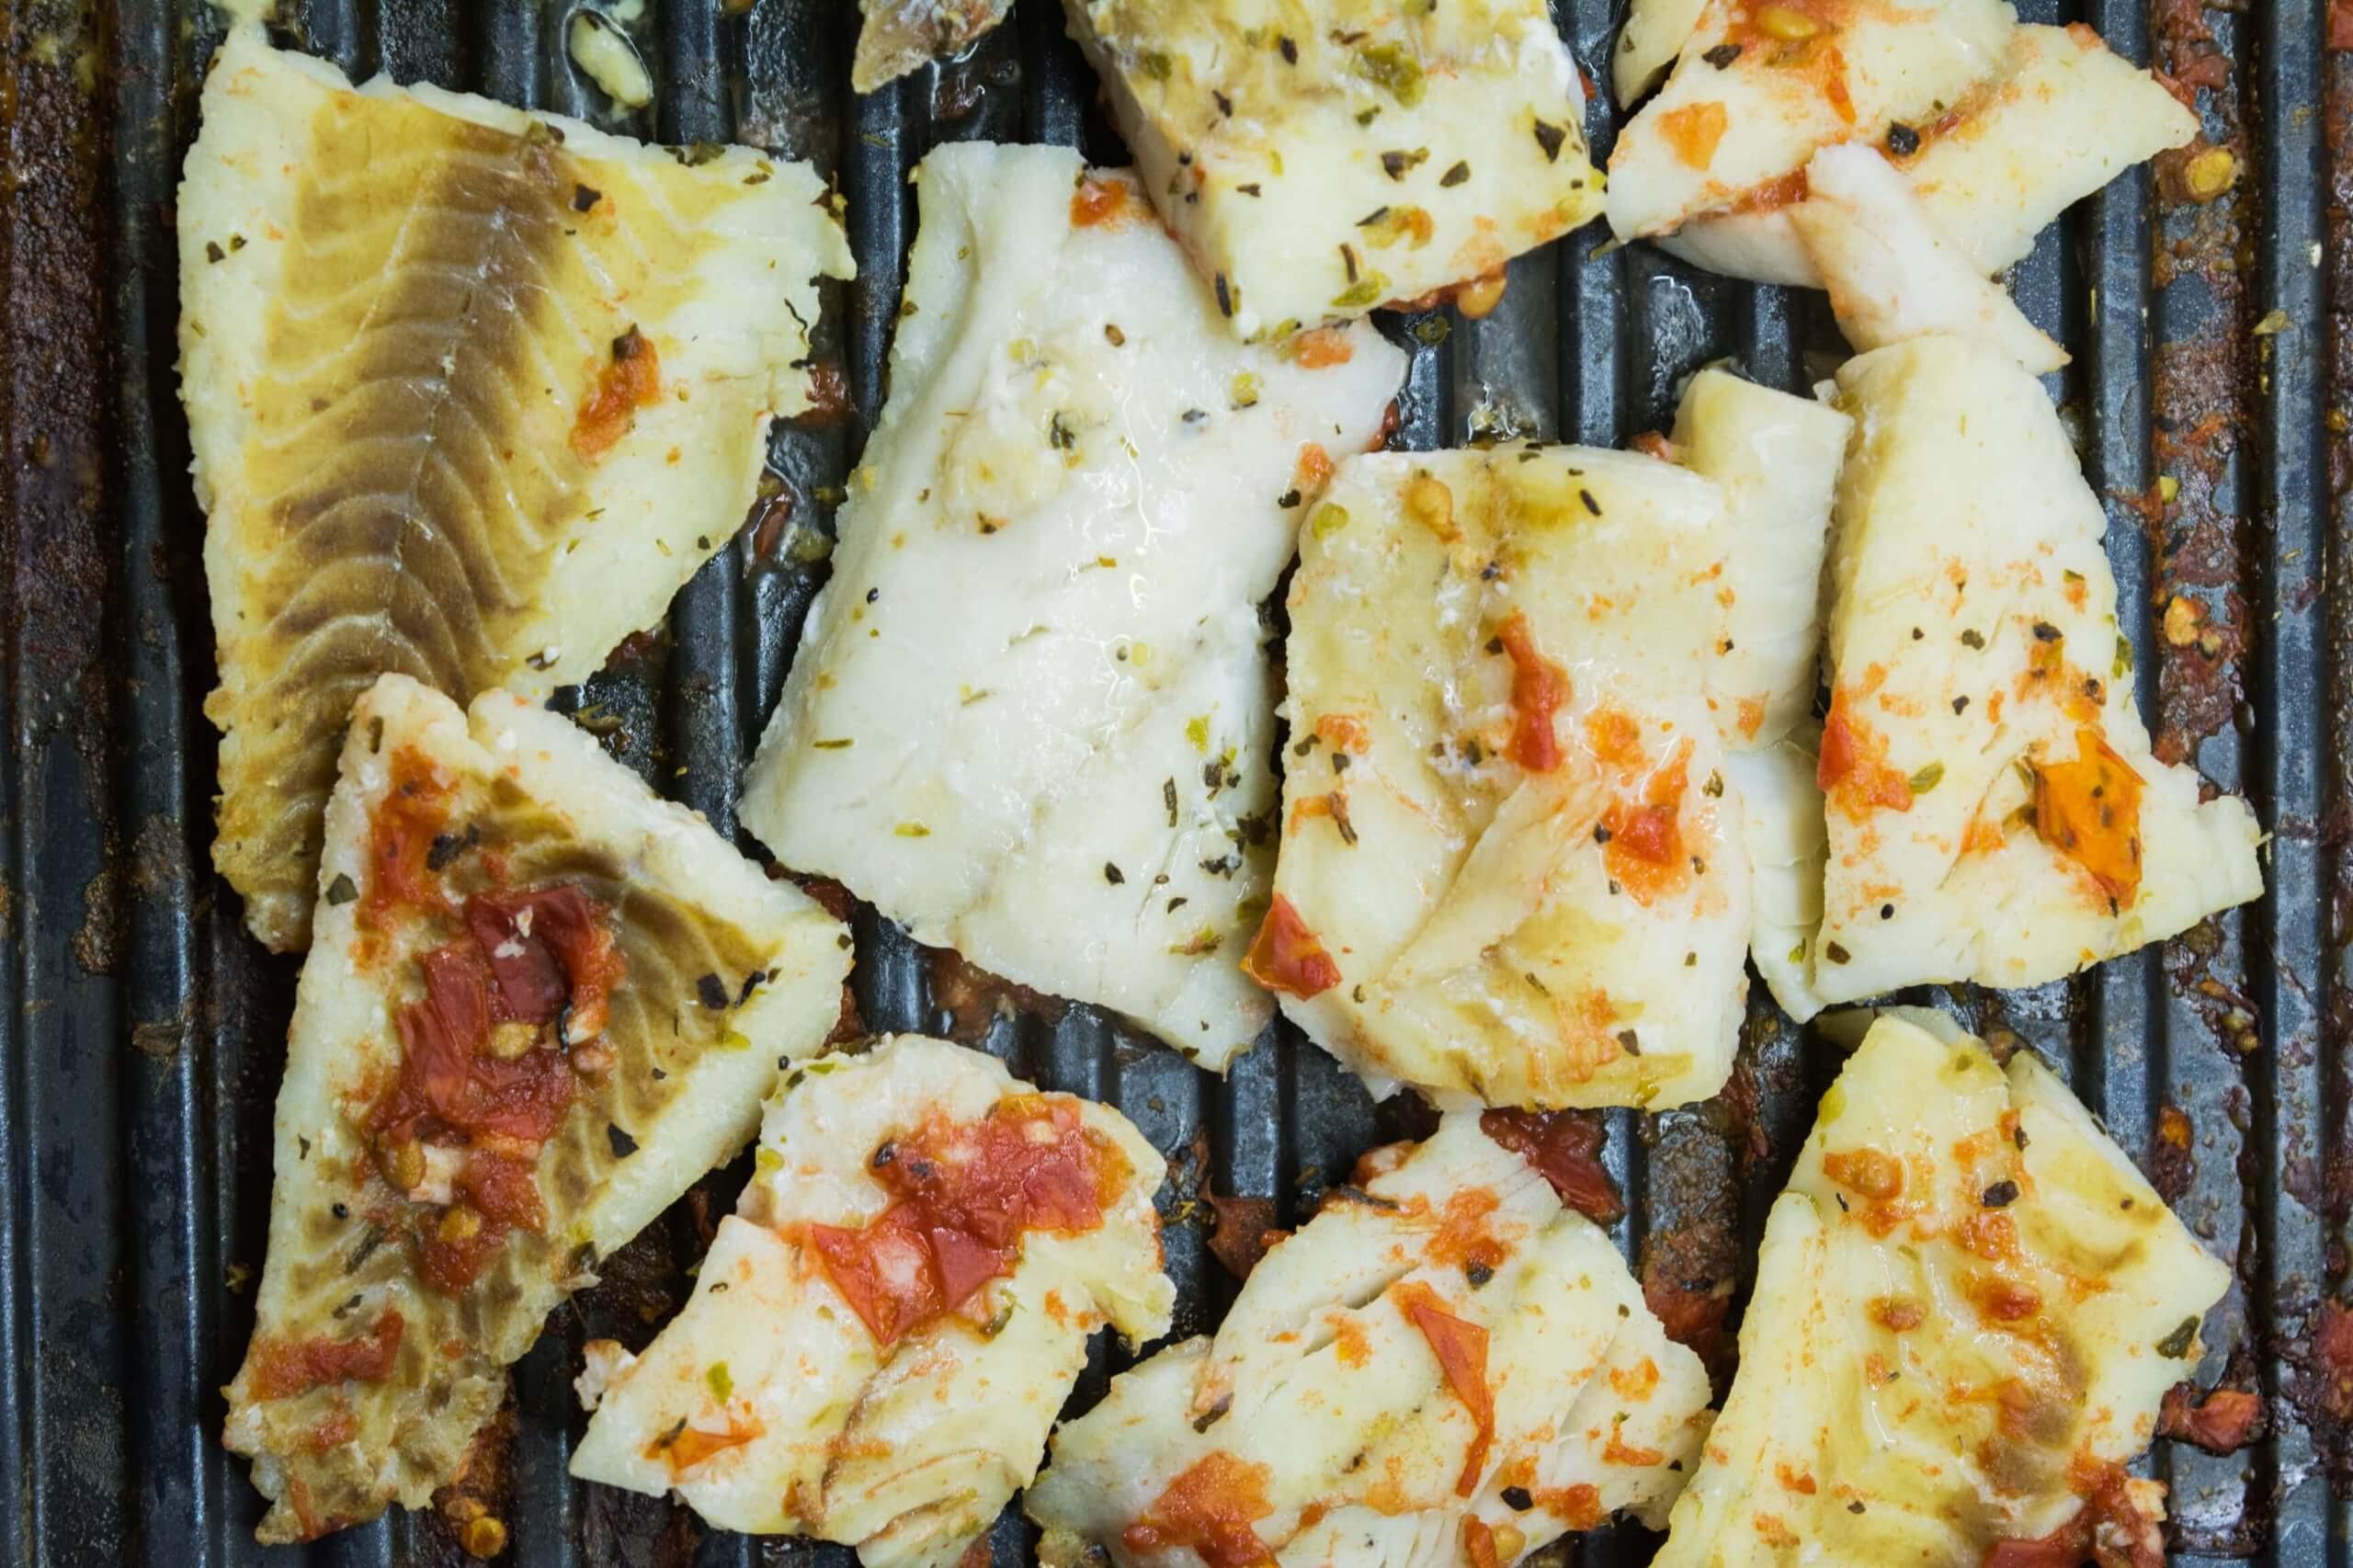 Fish grilled recipe